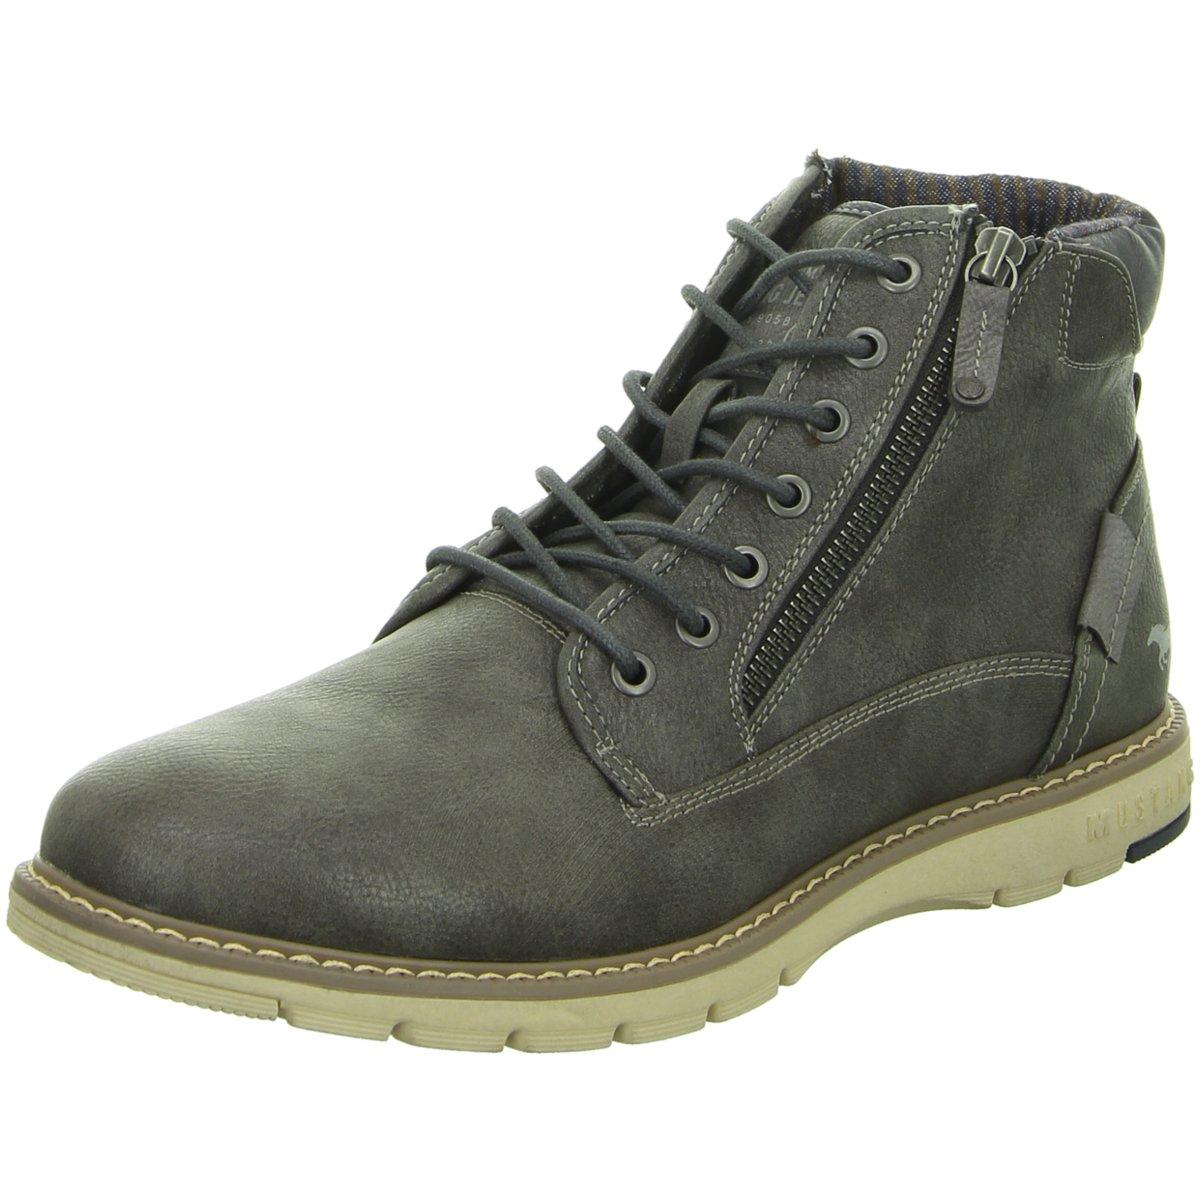 sale retailer 60ec3 bba0f Details zu Mustang Herren Stiefel 4105502-20 grau 353257